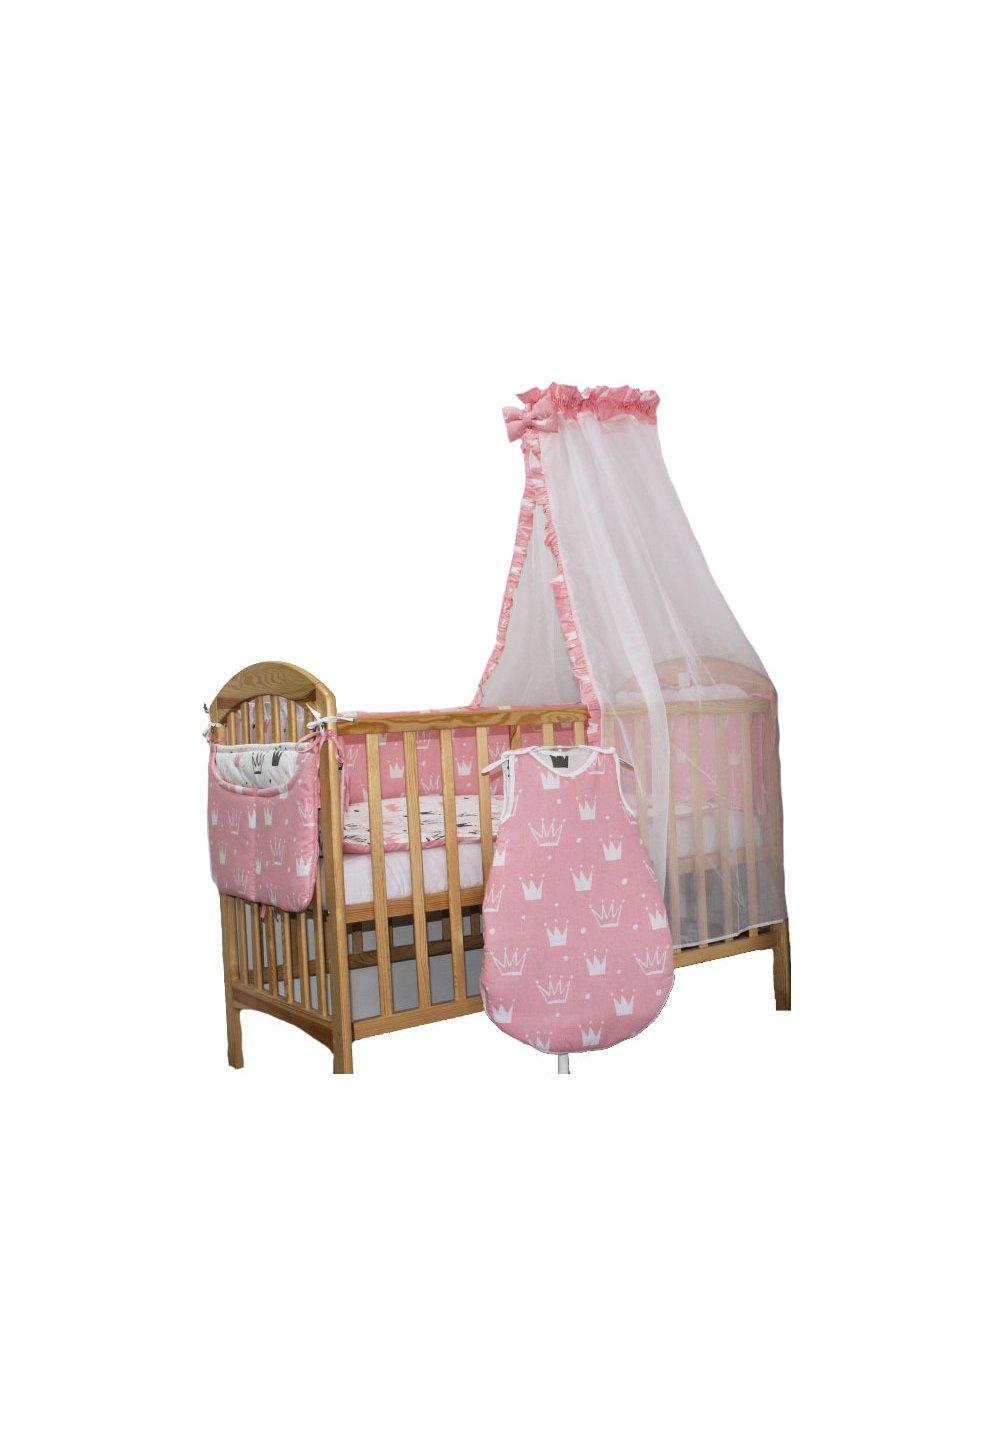 Lenjerie cu baldachin, 8 piese, Princess roz, 120 x 60 cm imagine